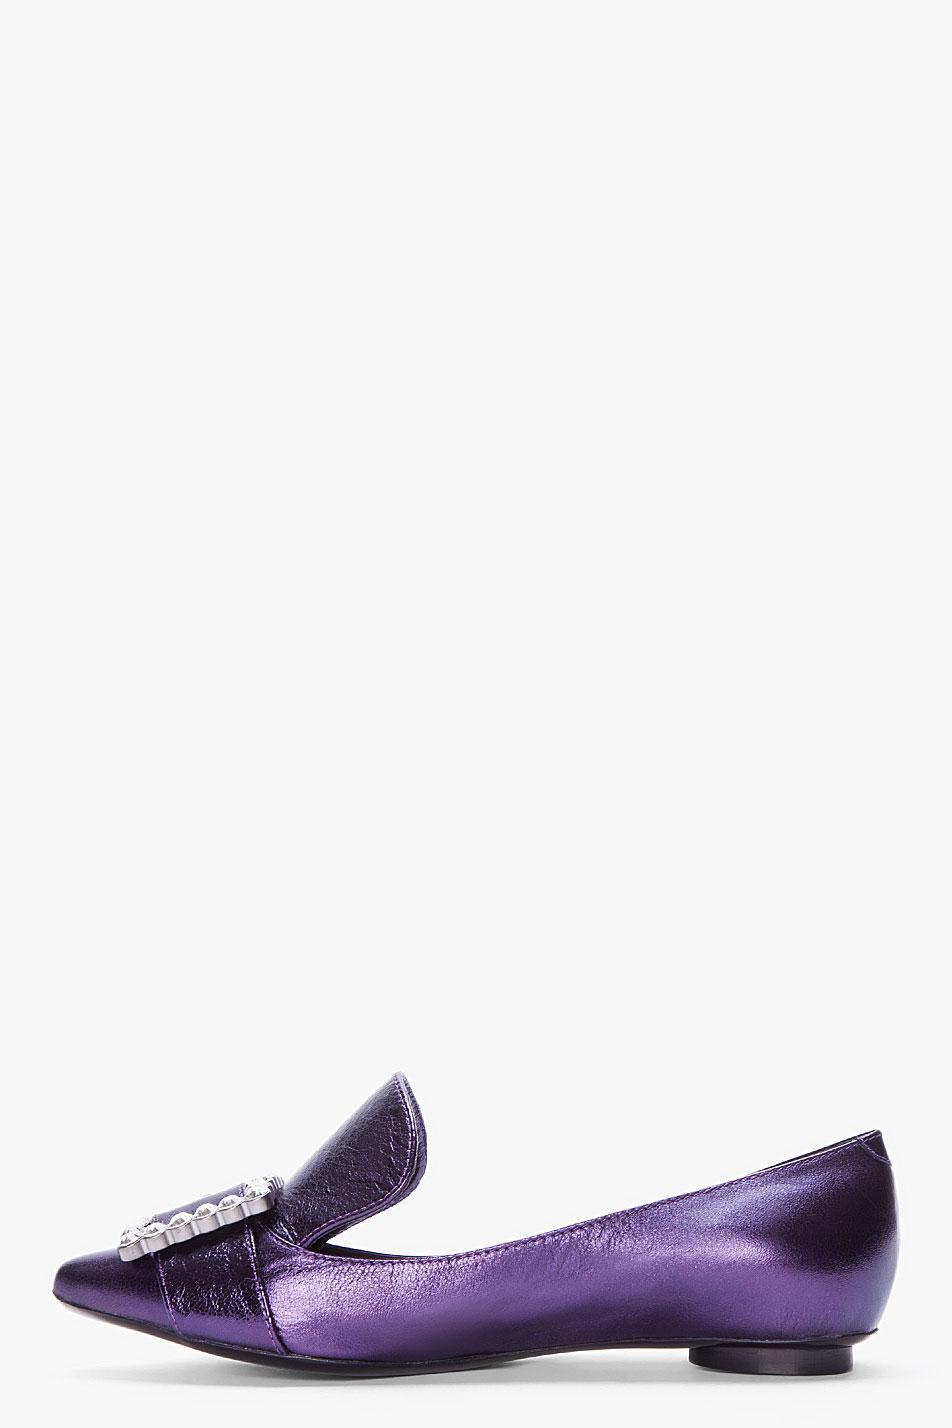 Marc Jacobs Metallic Purple Buckled Pilgrim Loafers Lyst